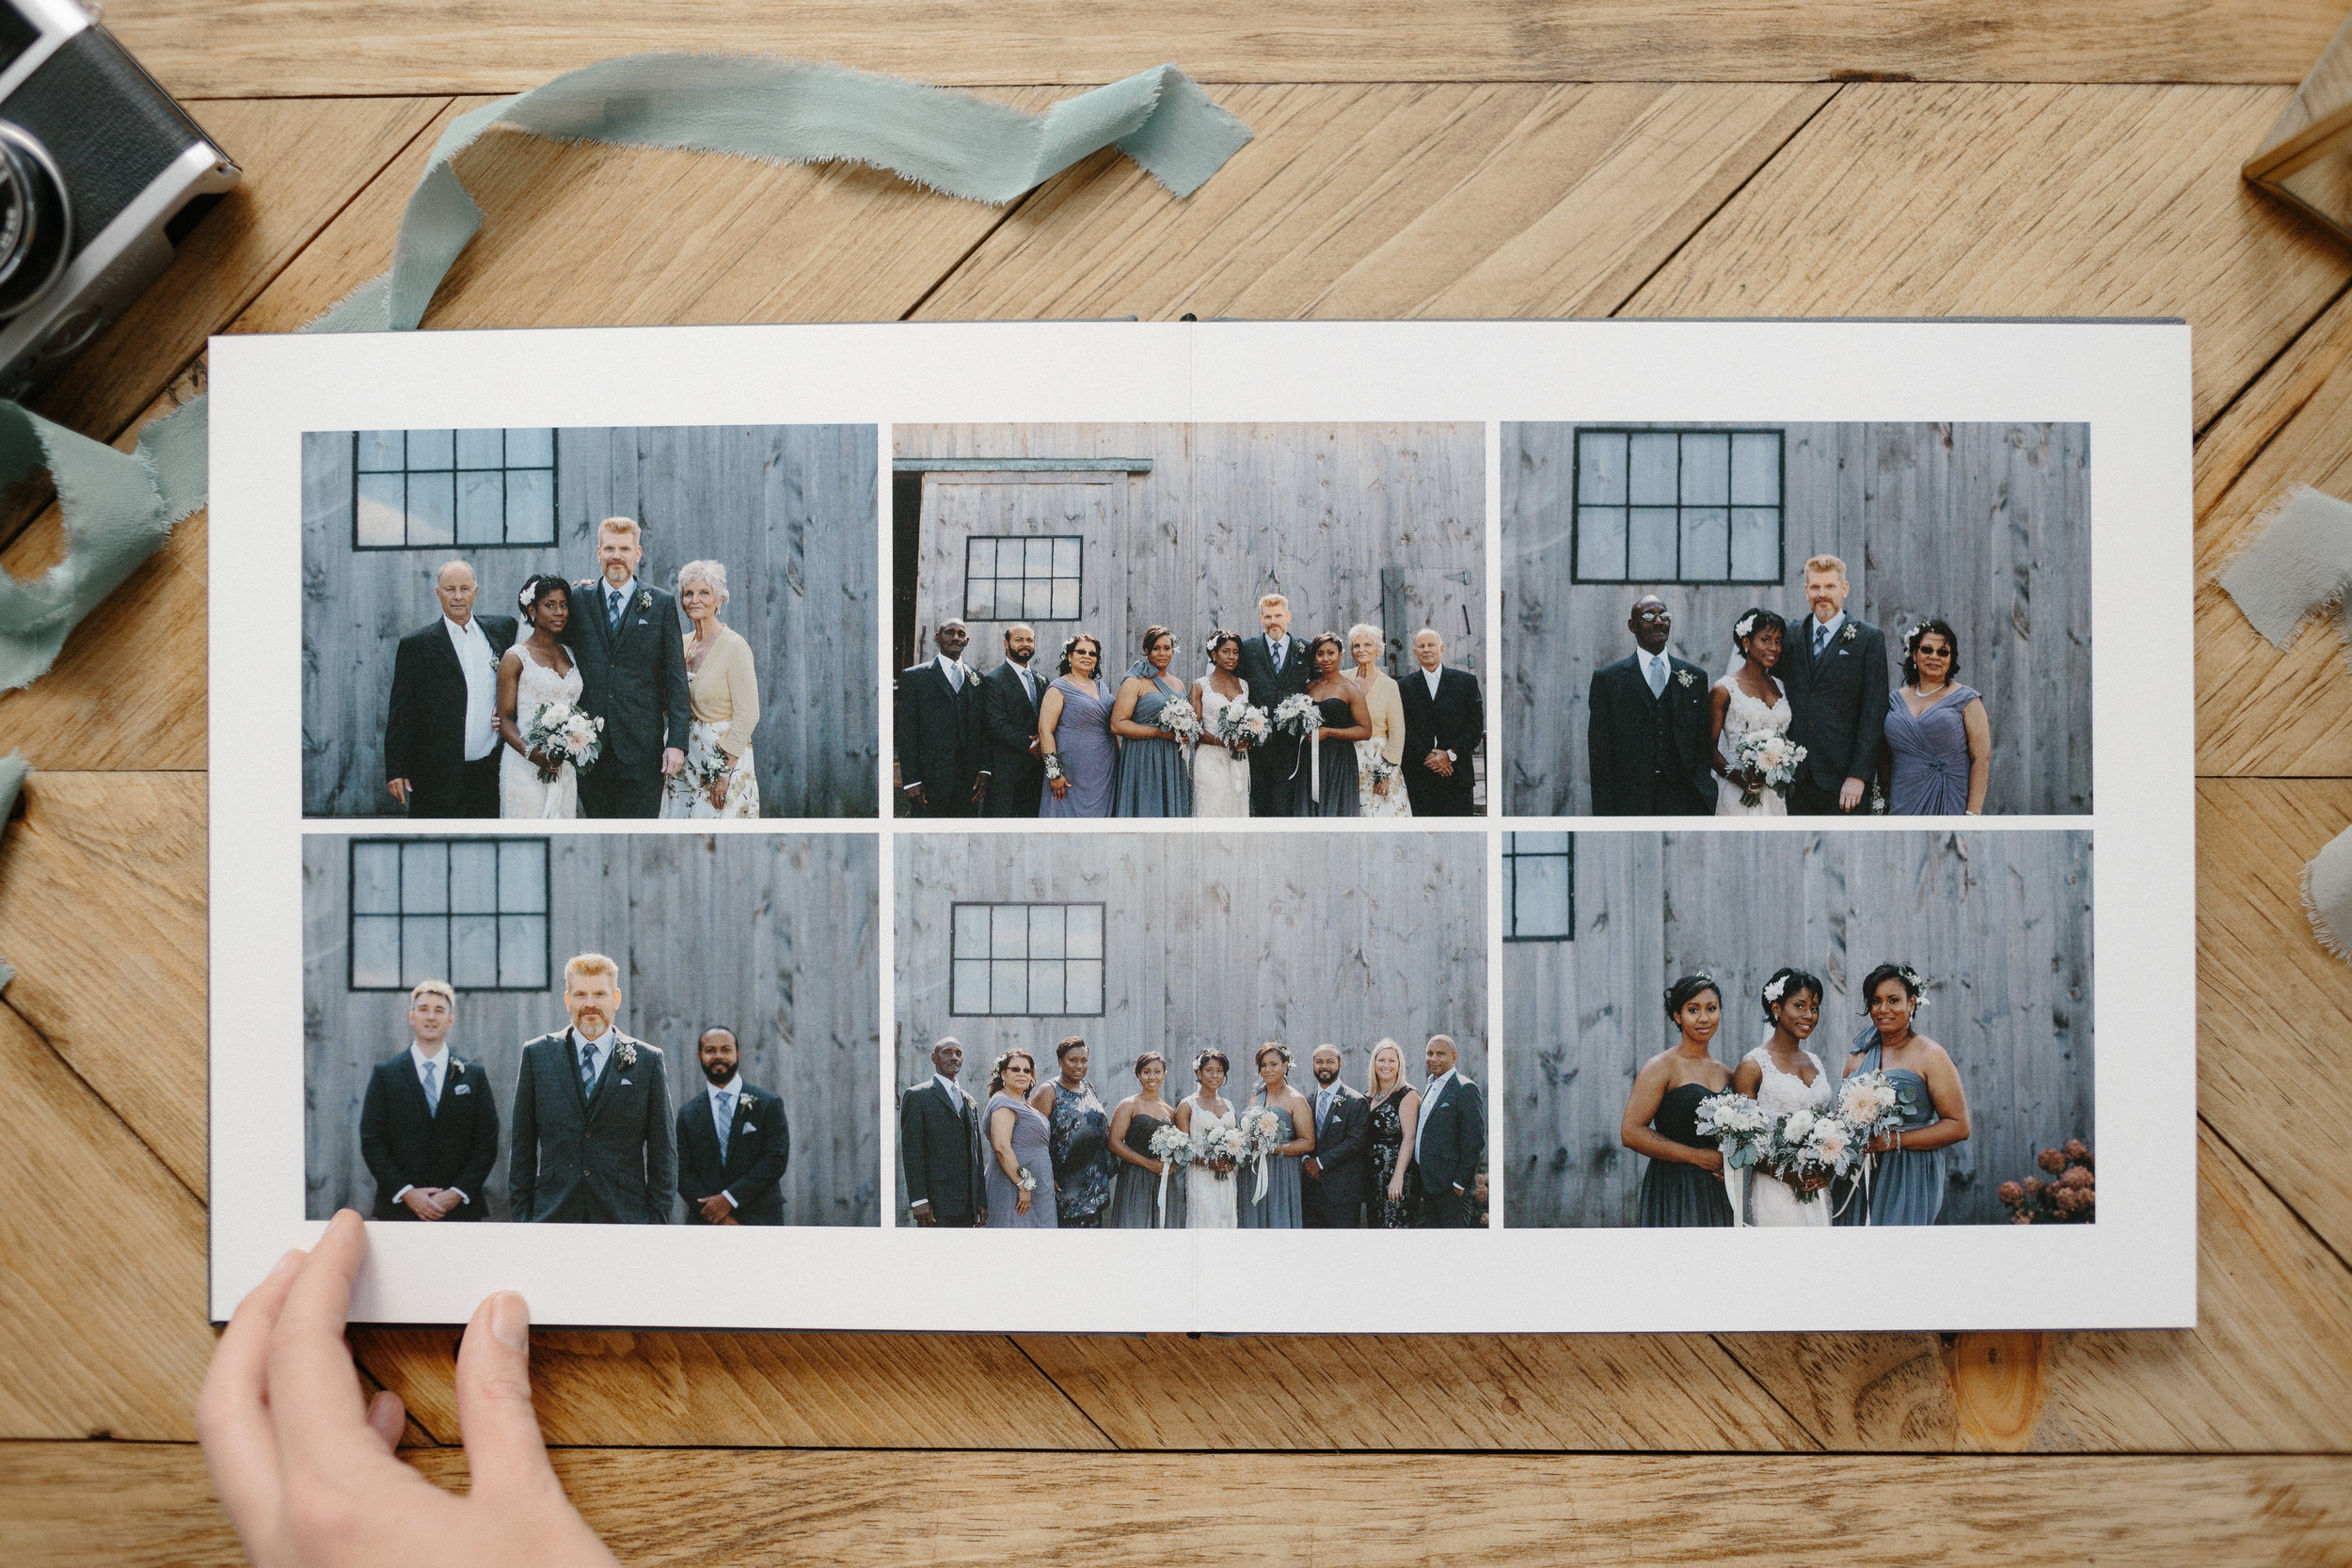 ryanne-hollies-photography-wedding-album-design-details-tono-and-co-artifact-uprising-80.jpg